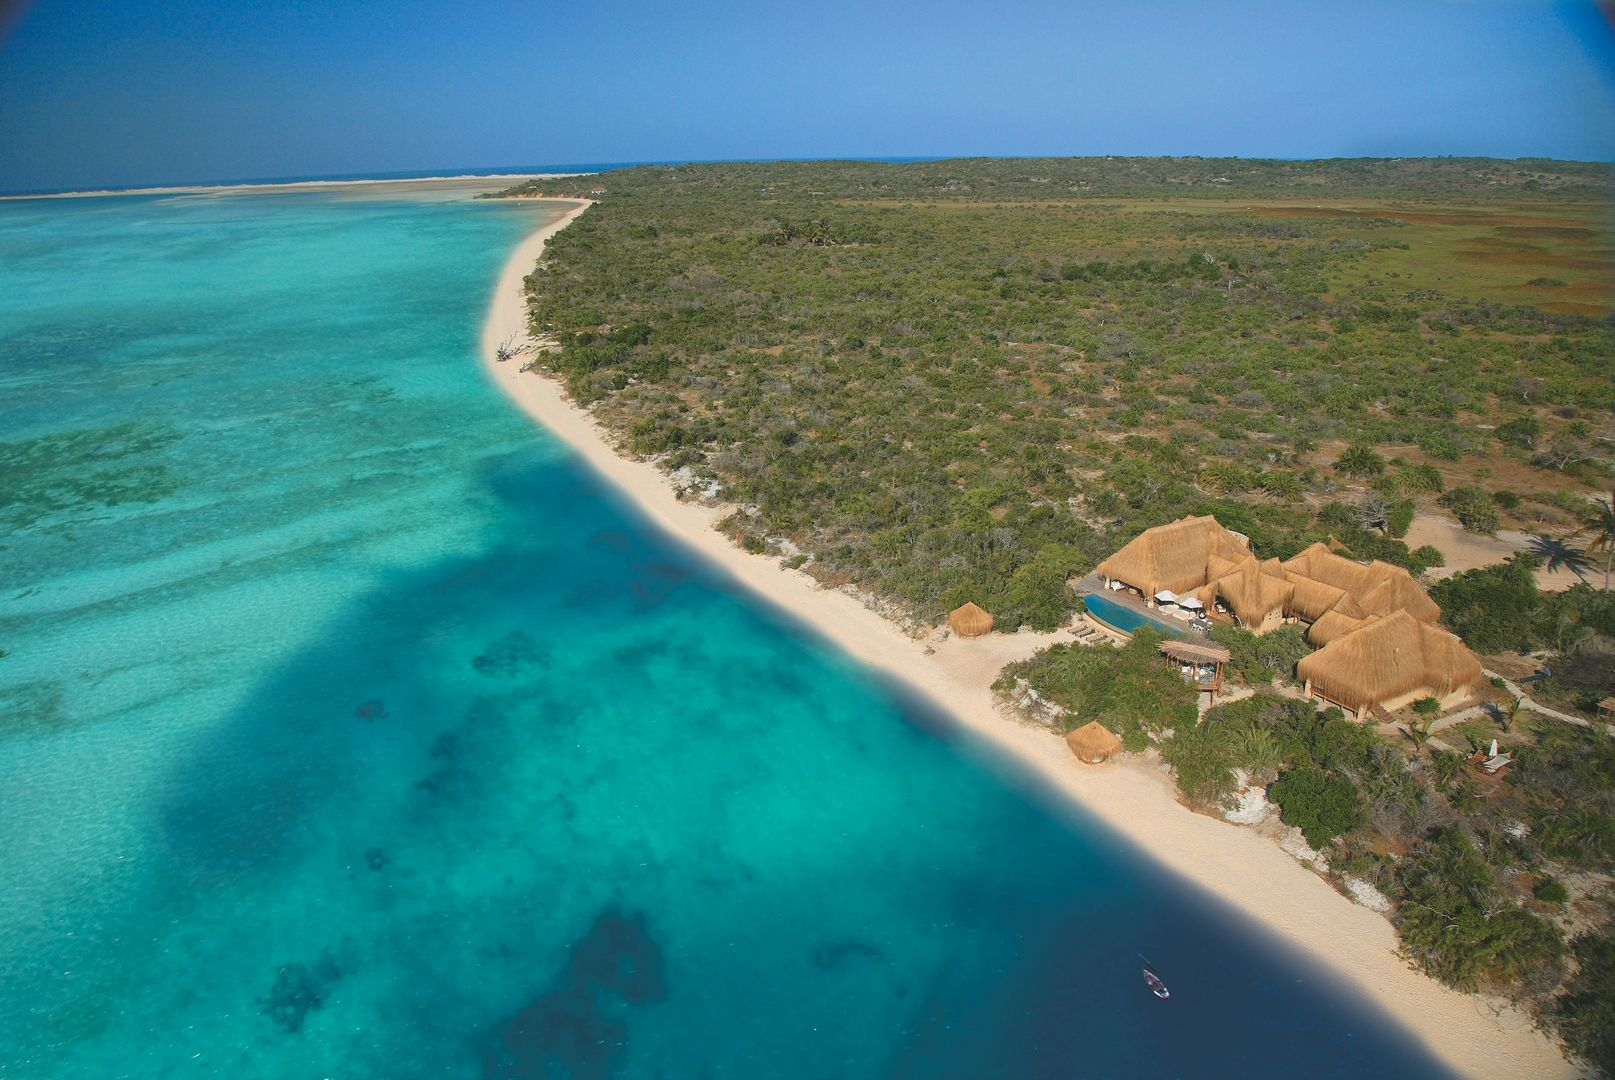 Vilanculos, Inhassoro & Bazaruto - Azura Benguerra Lodge Mozambique